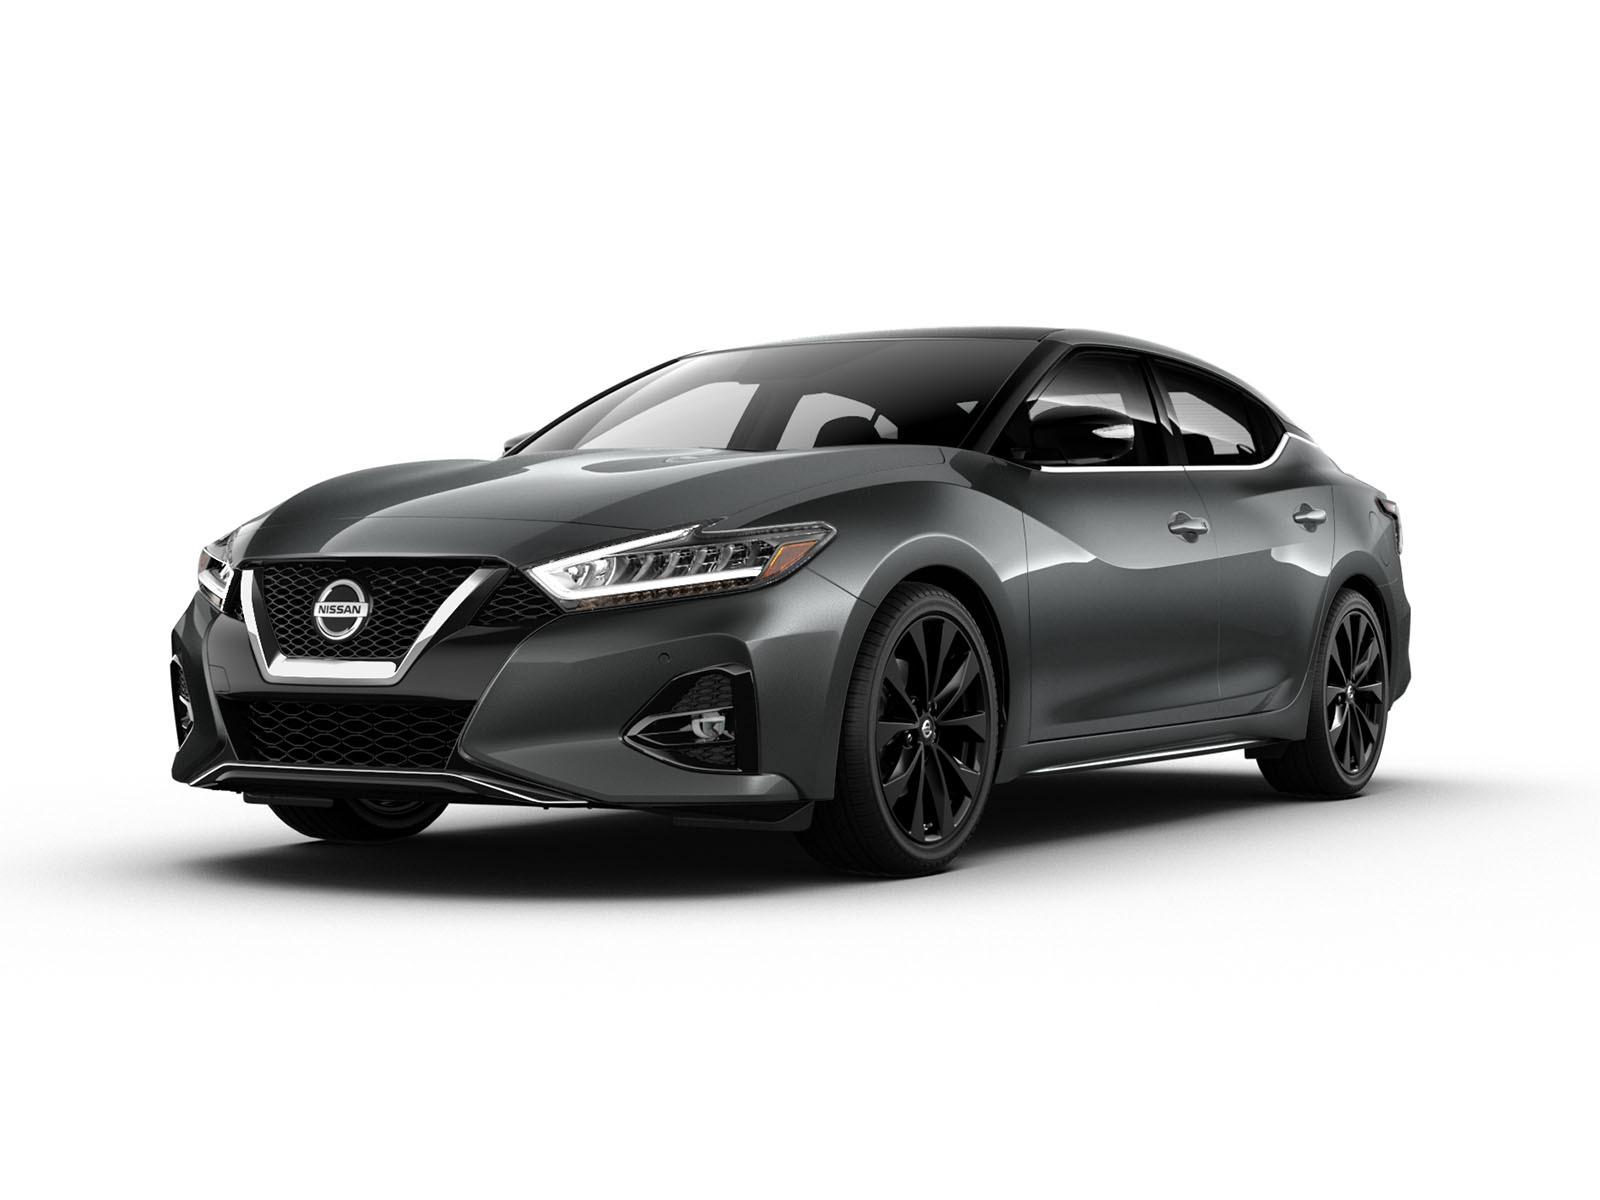 2020 Nissan Maxima SR full